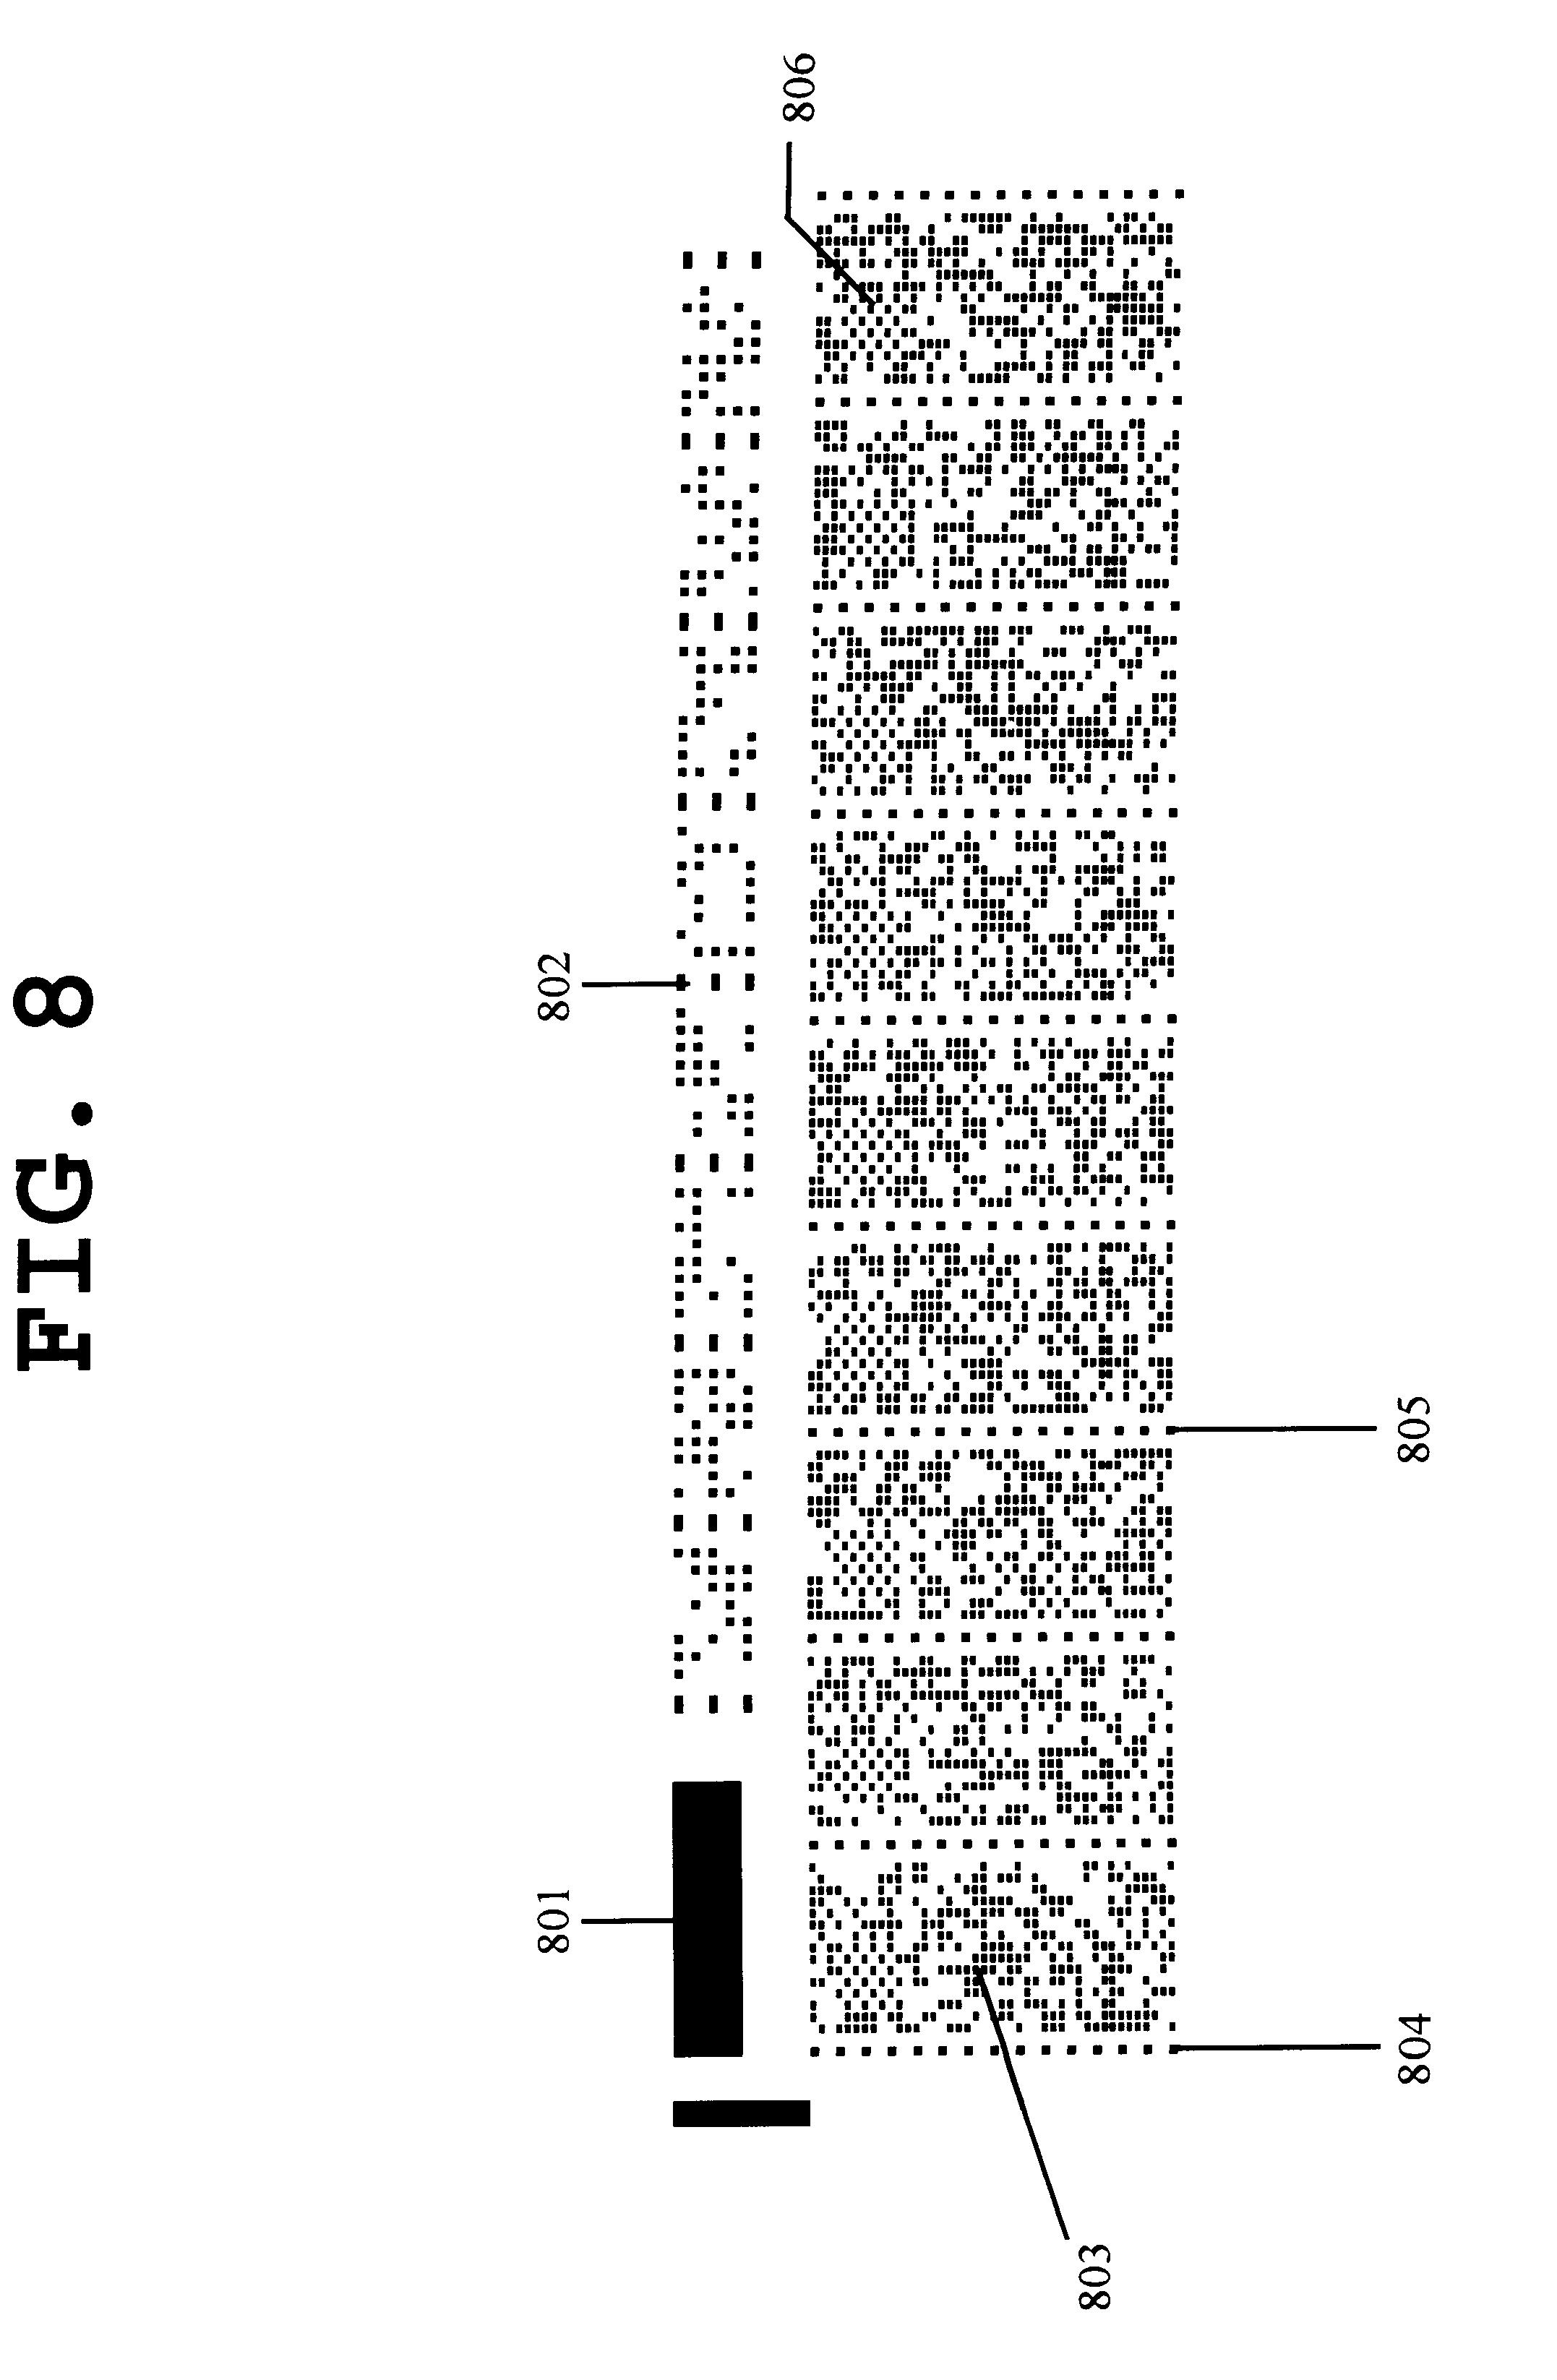 Patent US 6,176,427 B1